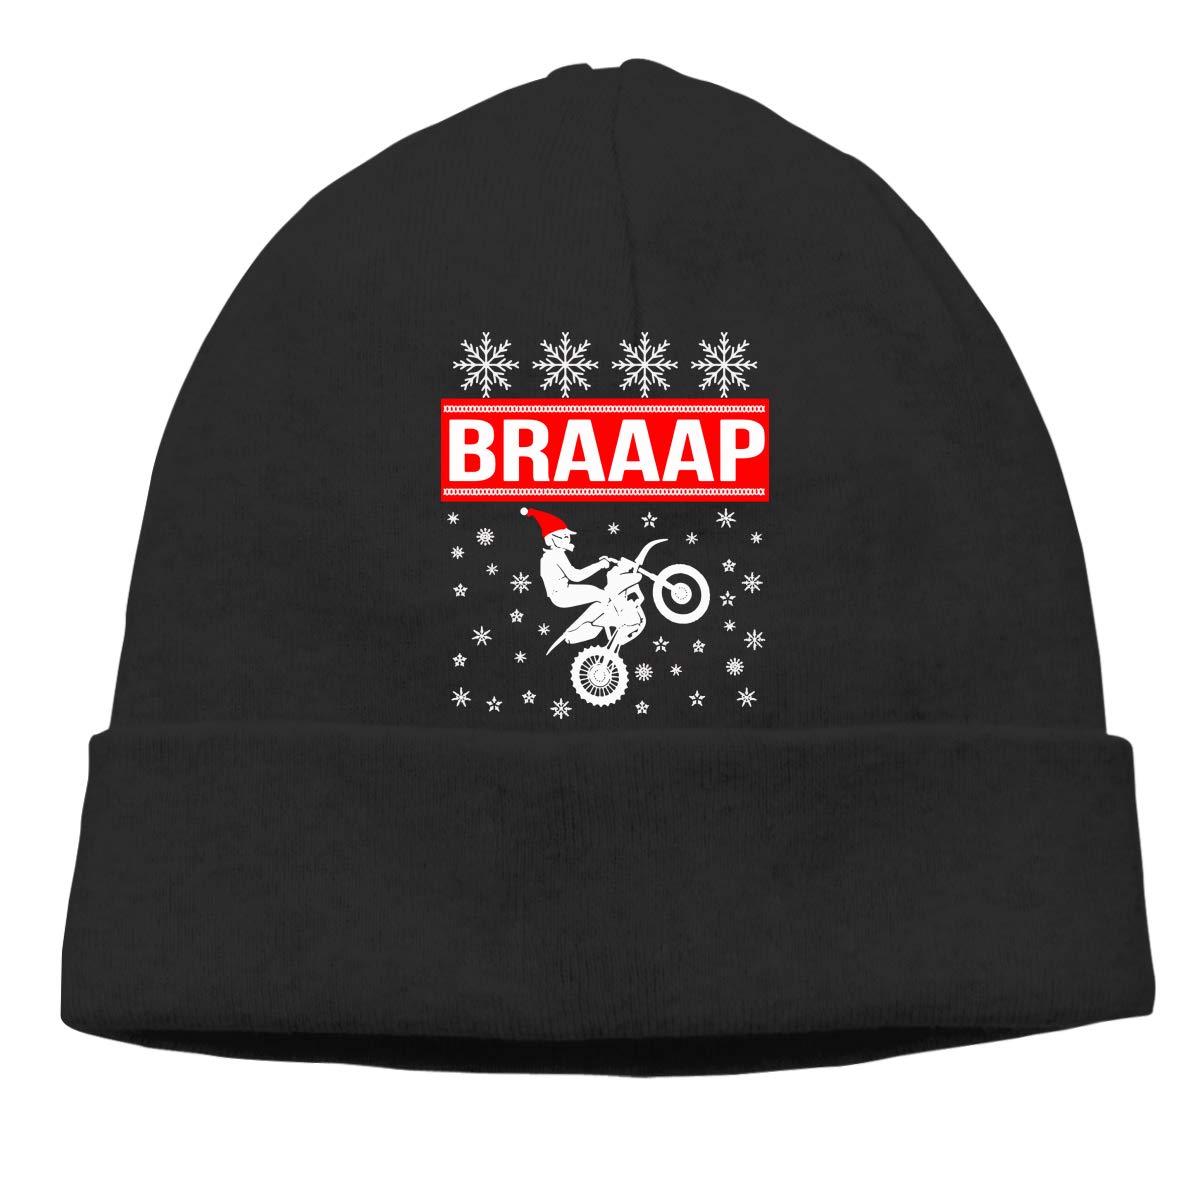 GDSG5/&4 Brraaap Dirt Bike Motocross Men Women Stretchy /& Soft Sports Beanie Cap